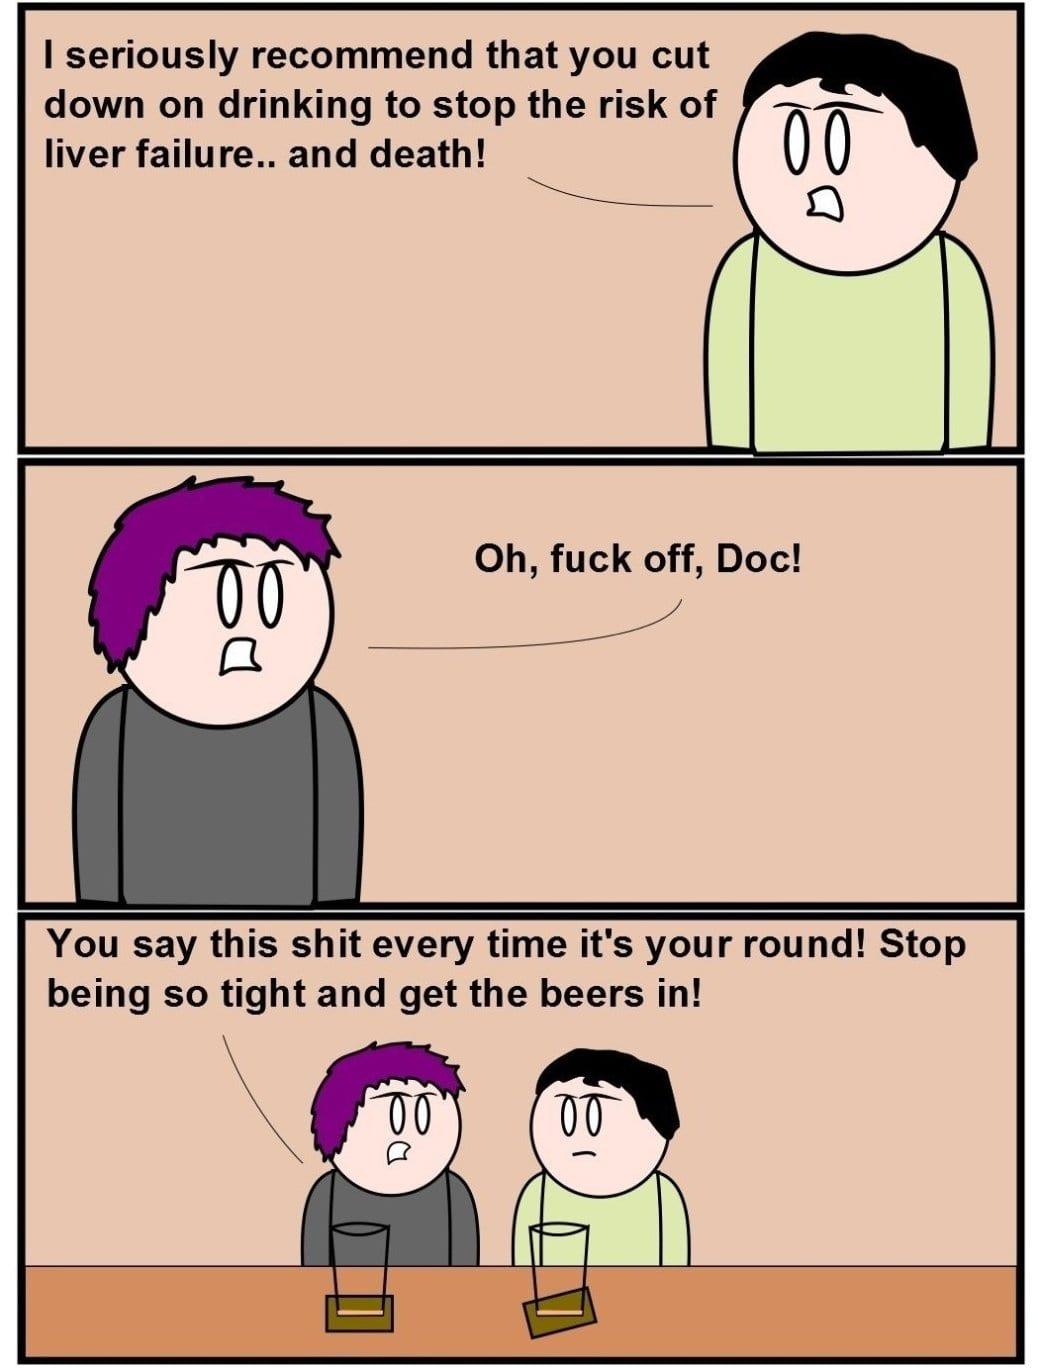 funny-lol-meme-2014-sparky-doodles-alcohol